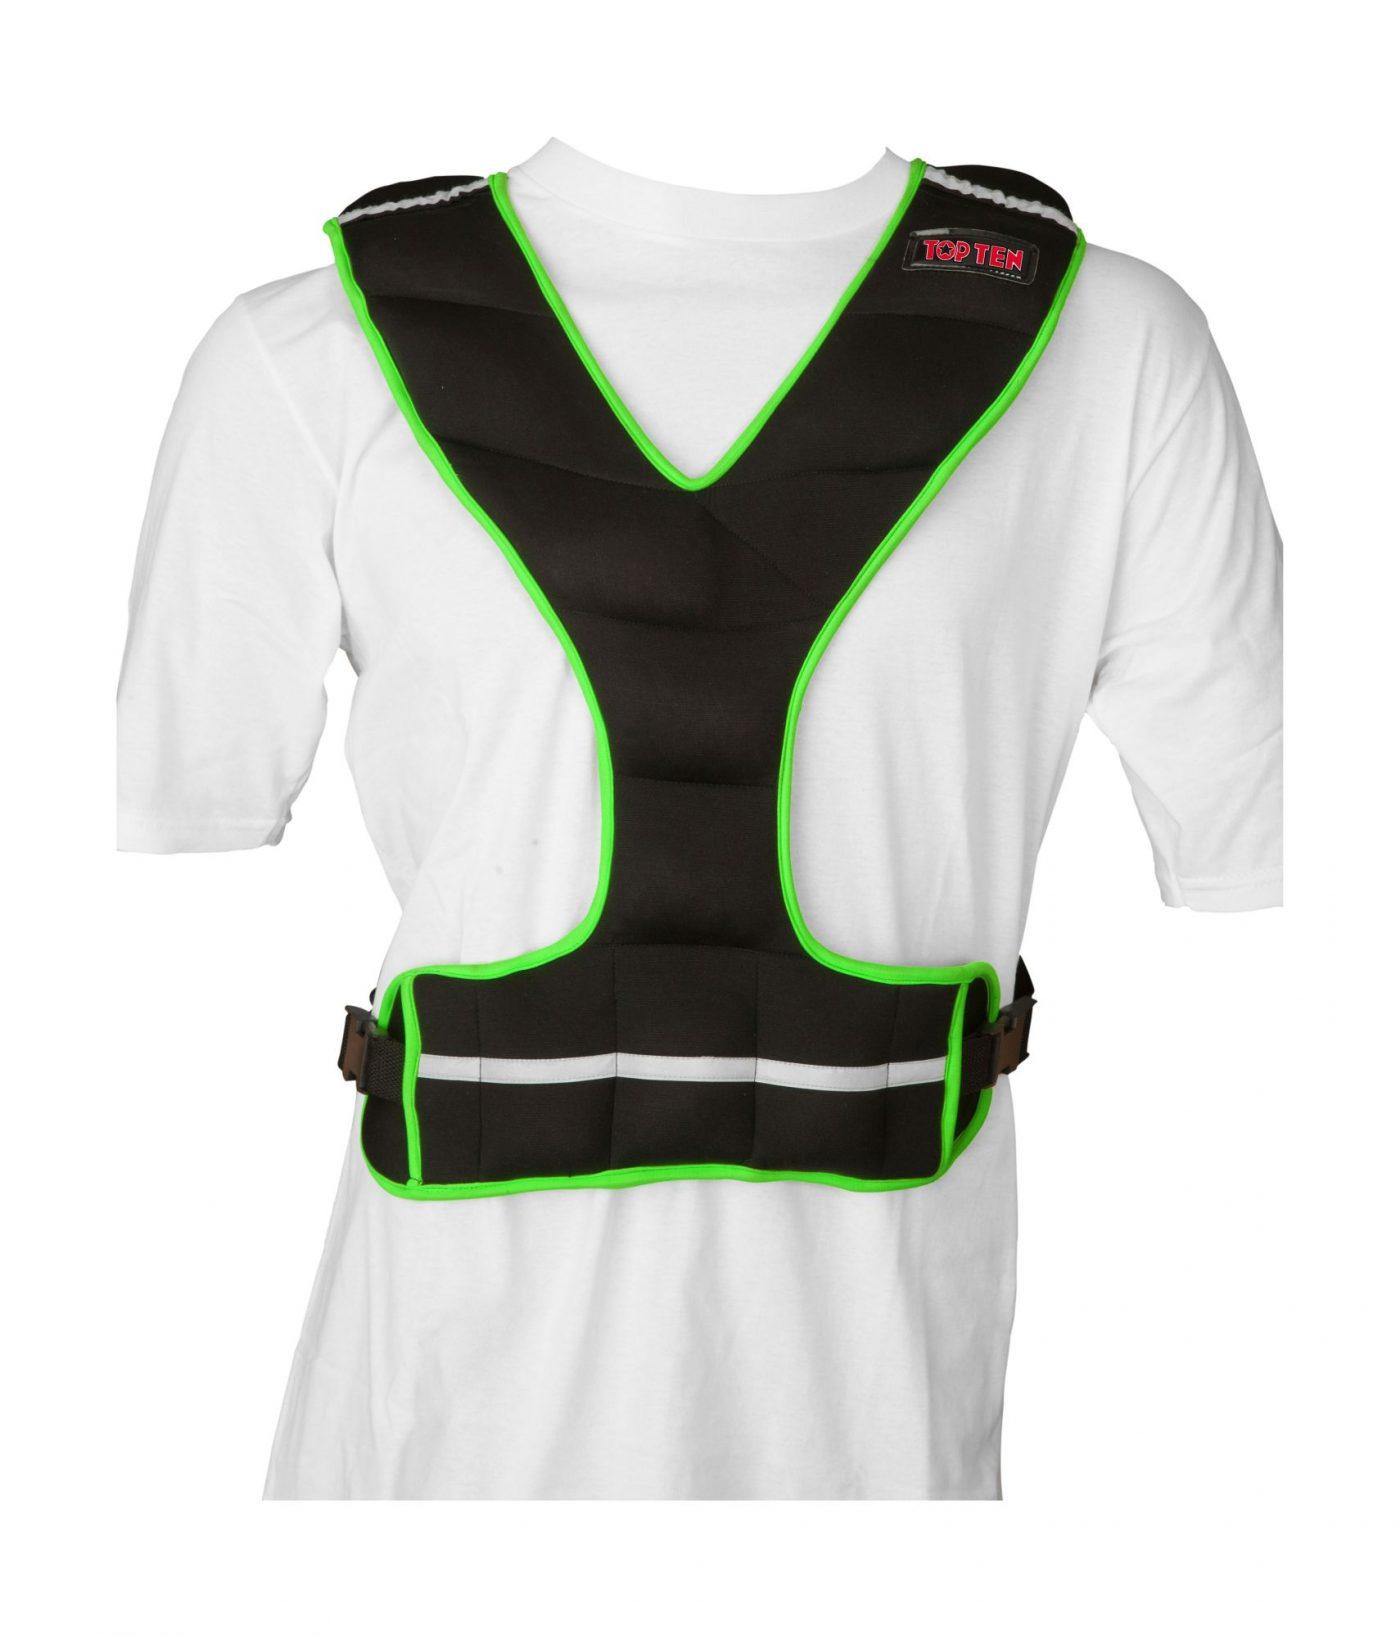 Gewichtsvest (neopreen) Zwart - Groen